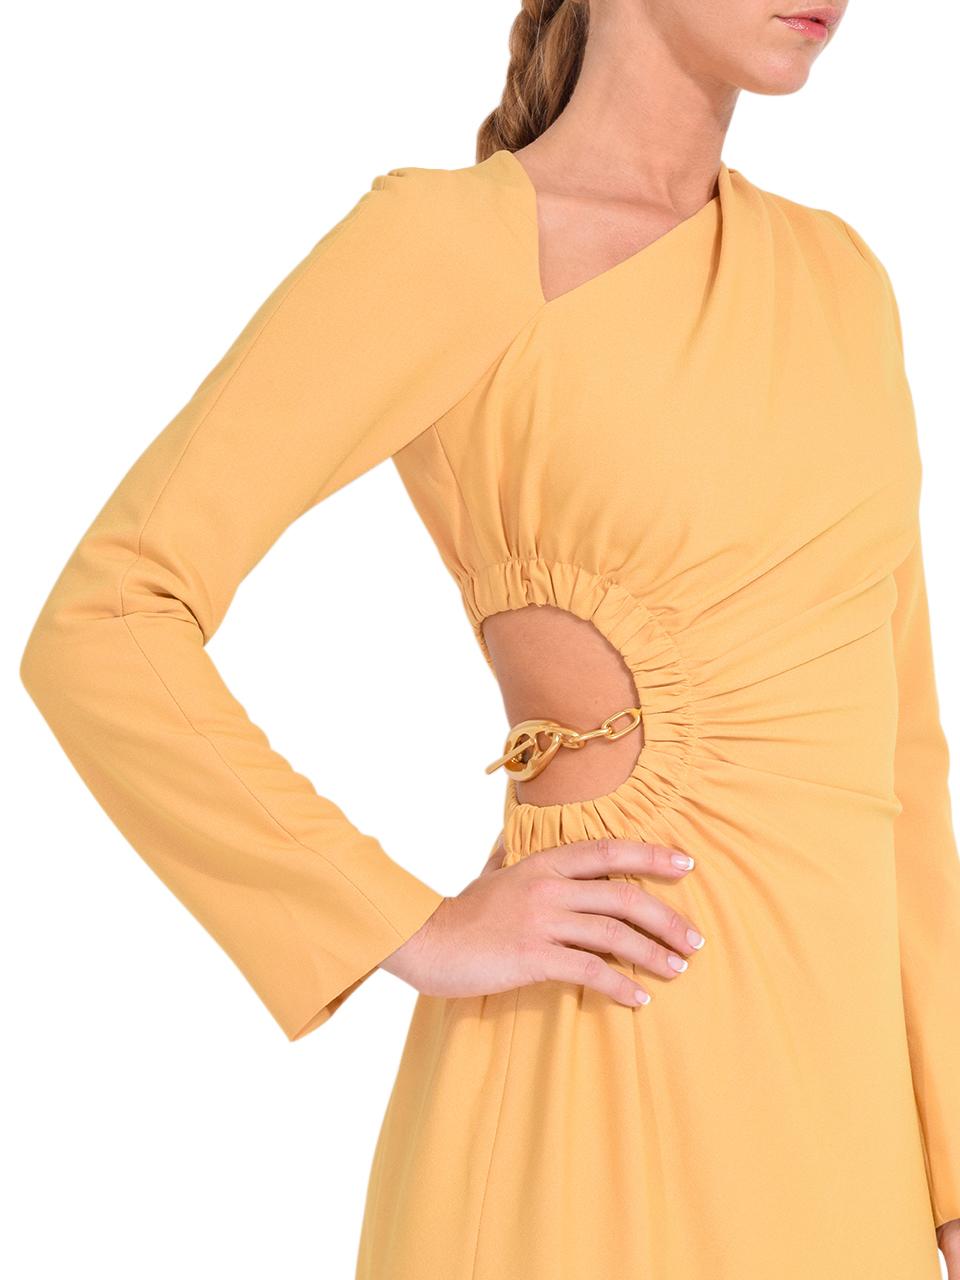 Jonathan Simkhai Christie Draped Cutout Dress in Honey Details